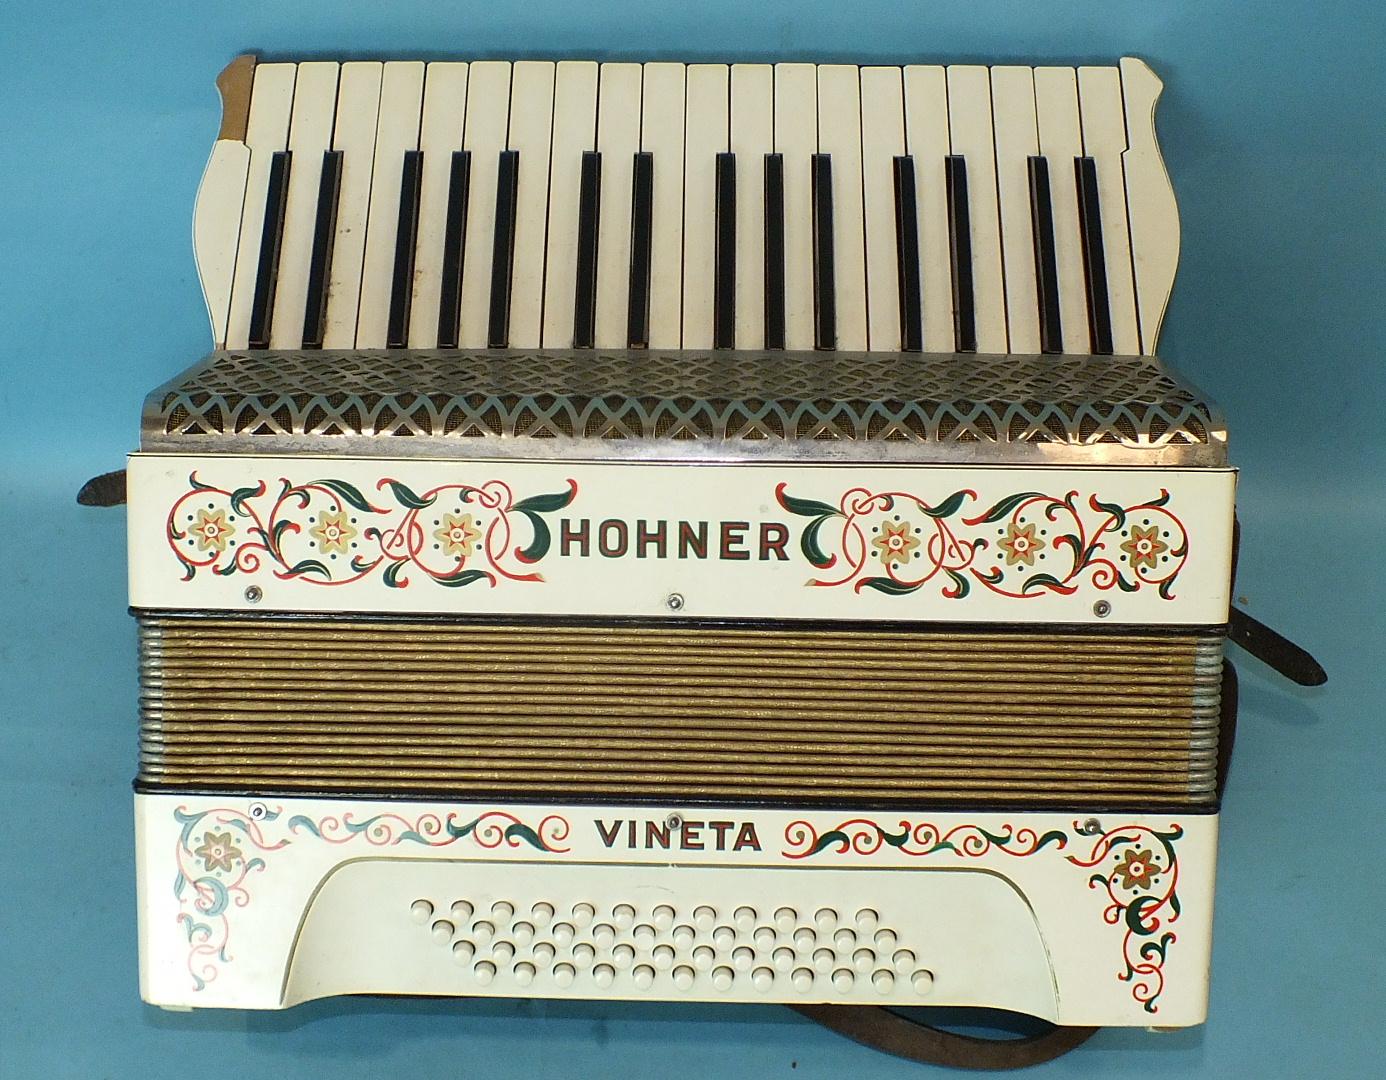 Lot 502 - A Hohner Vineta piano accordion.